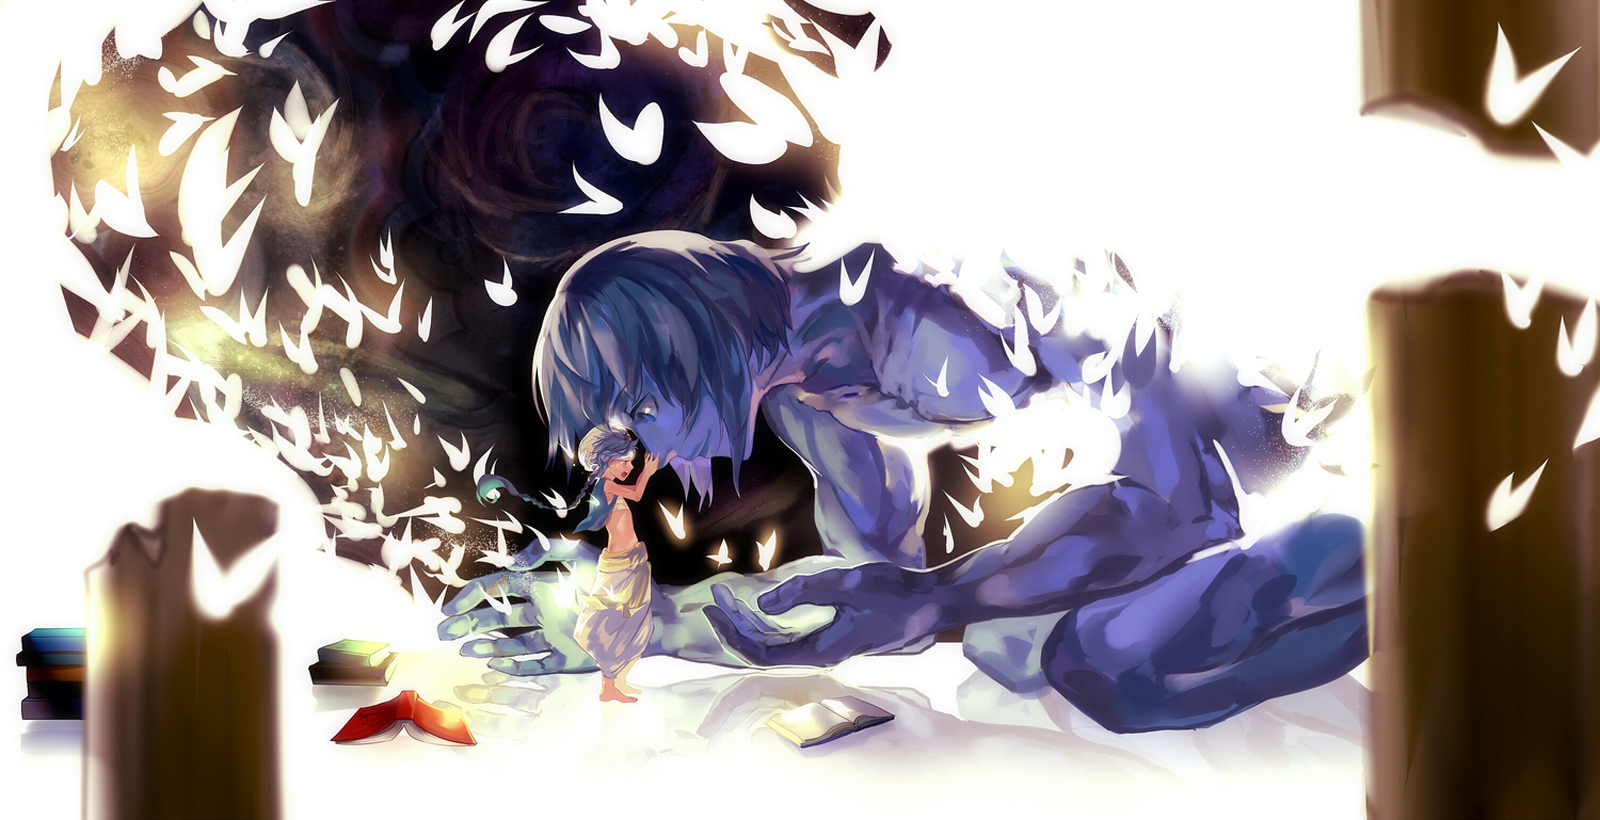 Hd Wallpaper Aladdin Ugo Magi Labyrinth Of Magic 103